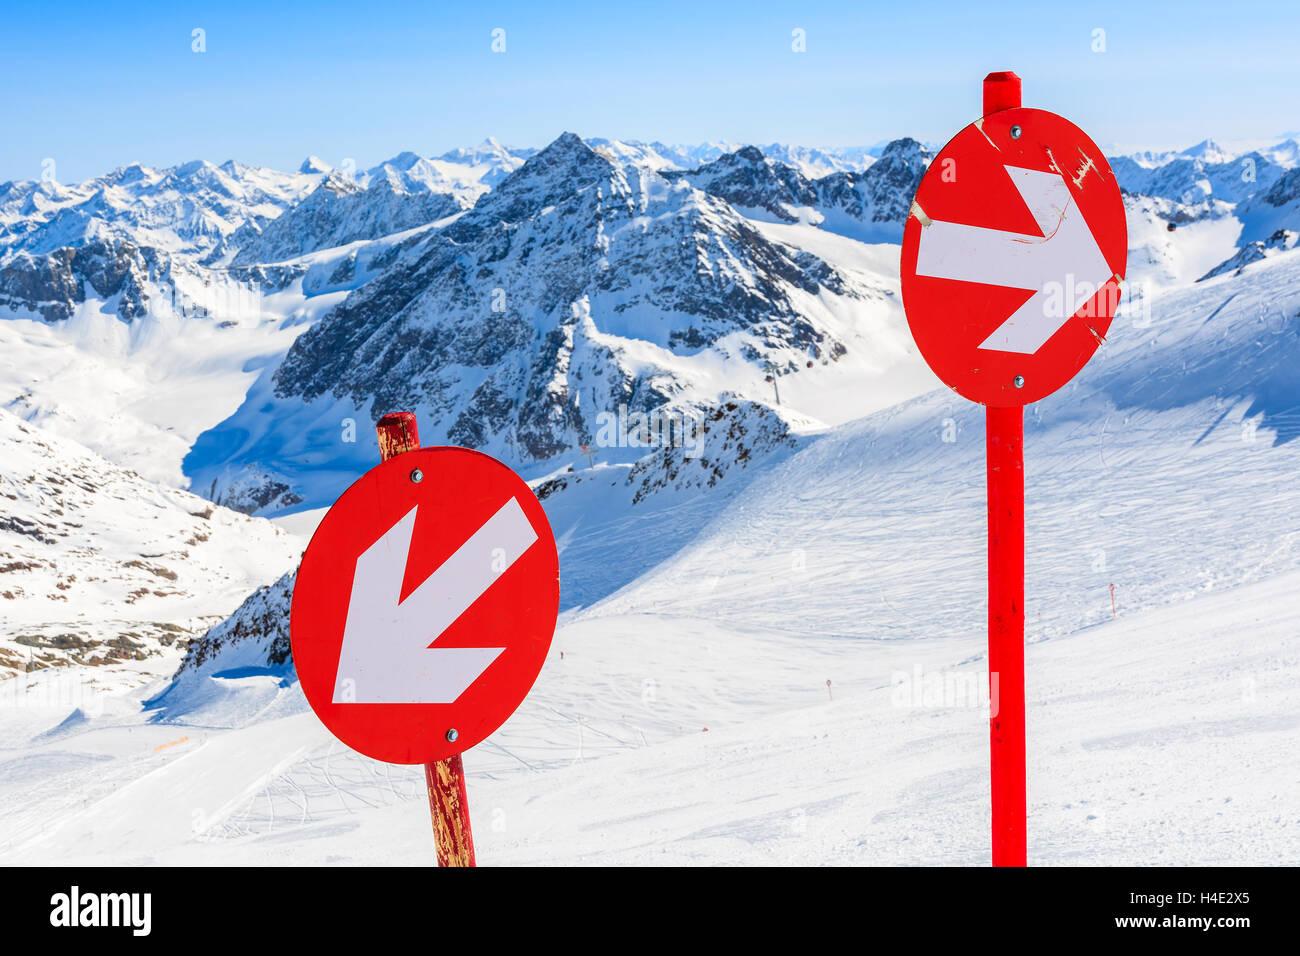 Red signs on ski slope in ski resort of Pitztal, Austrian Alps Stock Photo